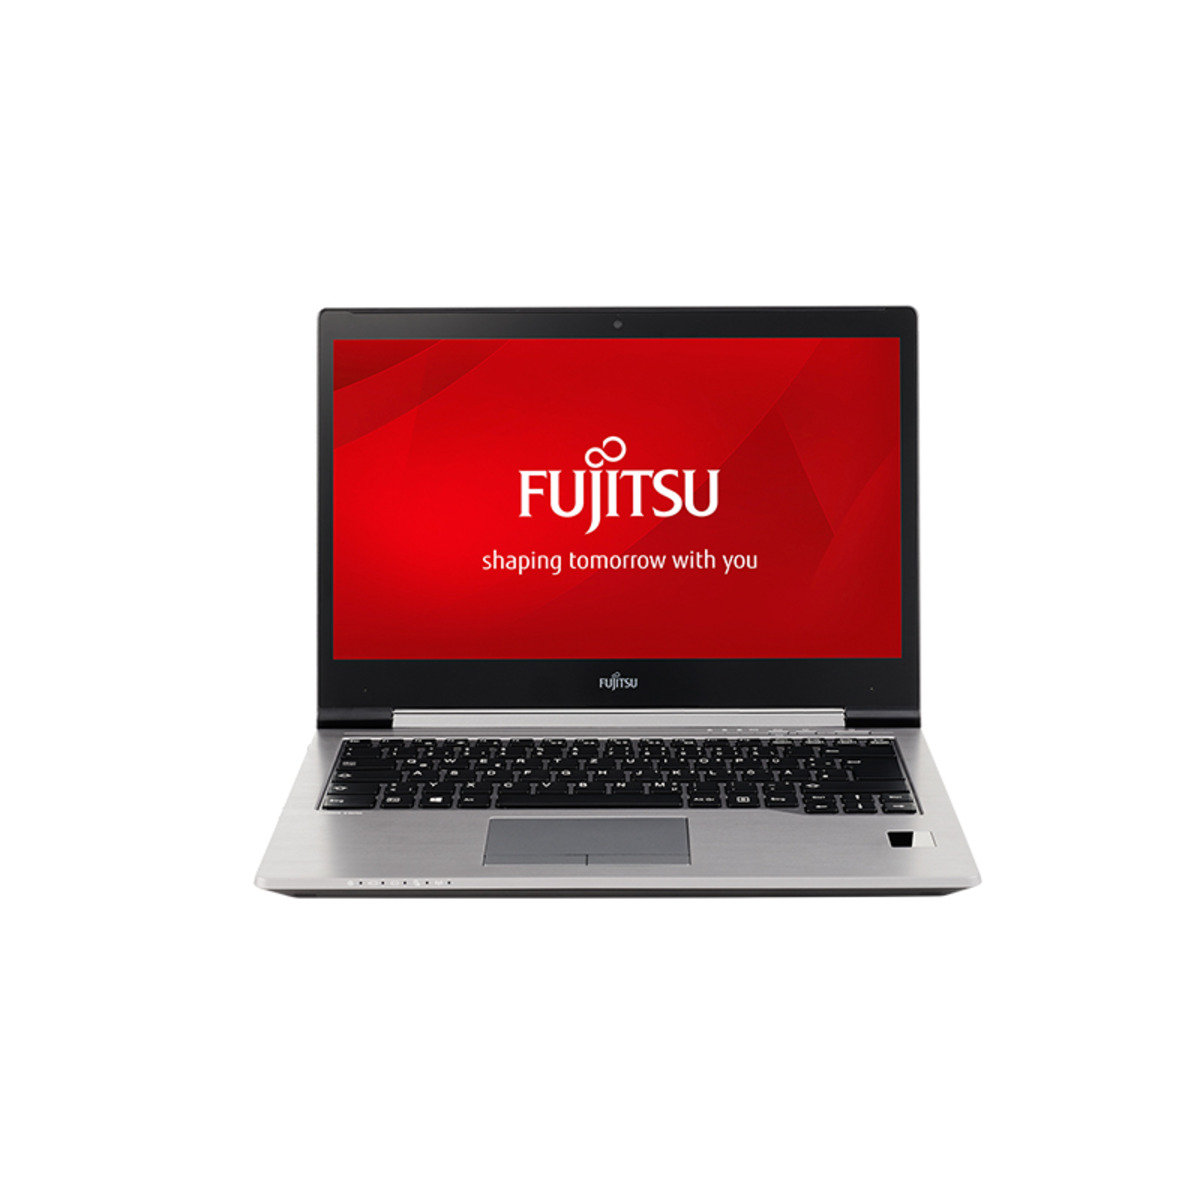 Fujitsu Lifebook U745M01S 日本制造 Core i5/128G SSD/Win 8.1 Pro